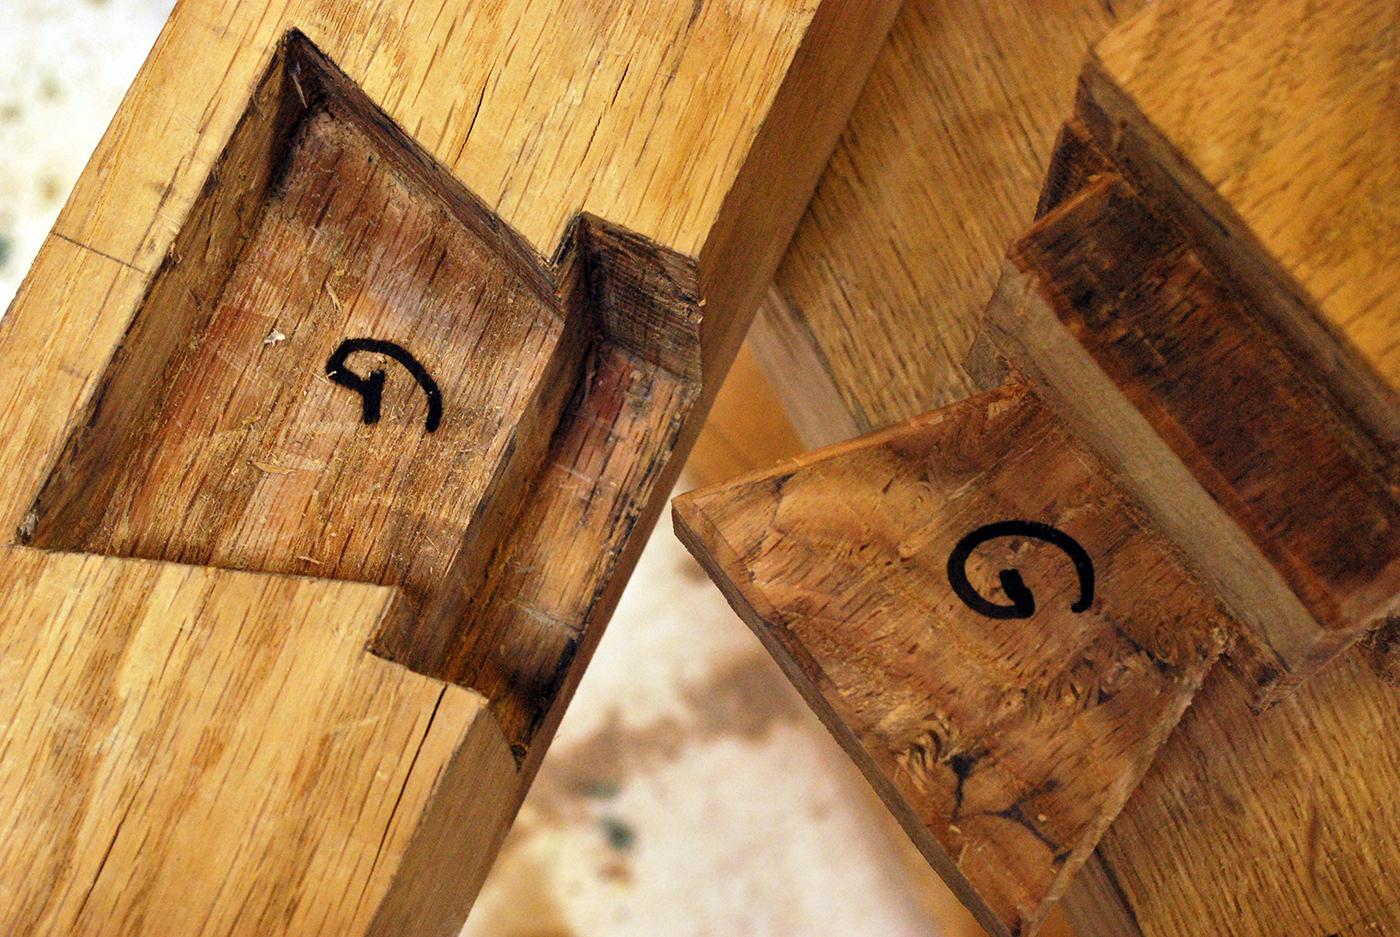 Green Oak Timber Framing & Rustic Shavehorse Construction - Wild Human